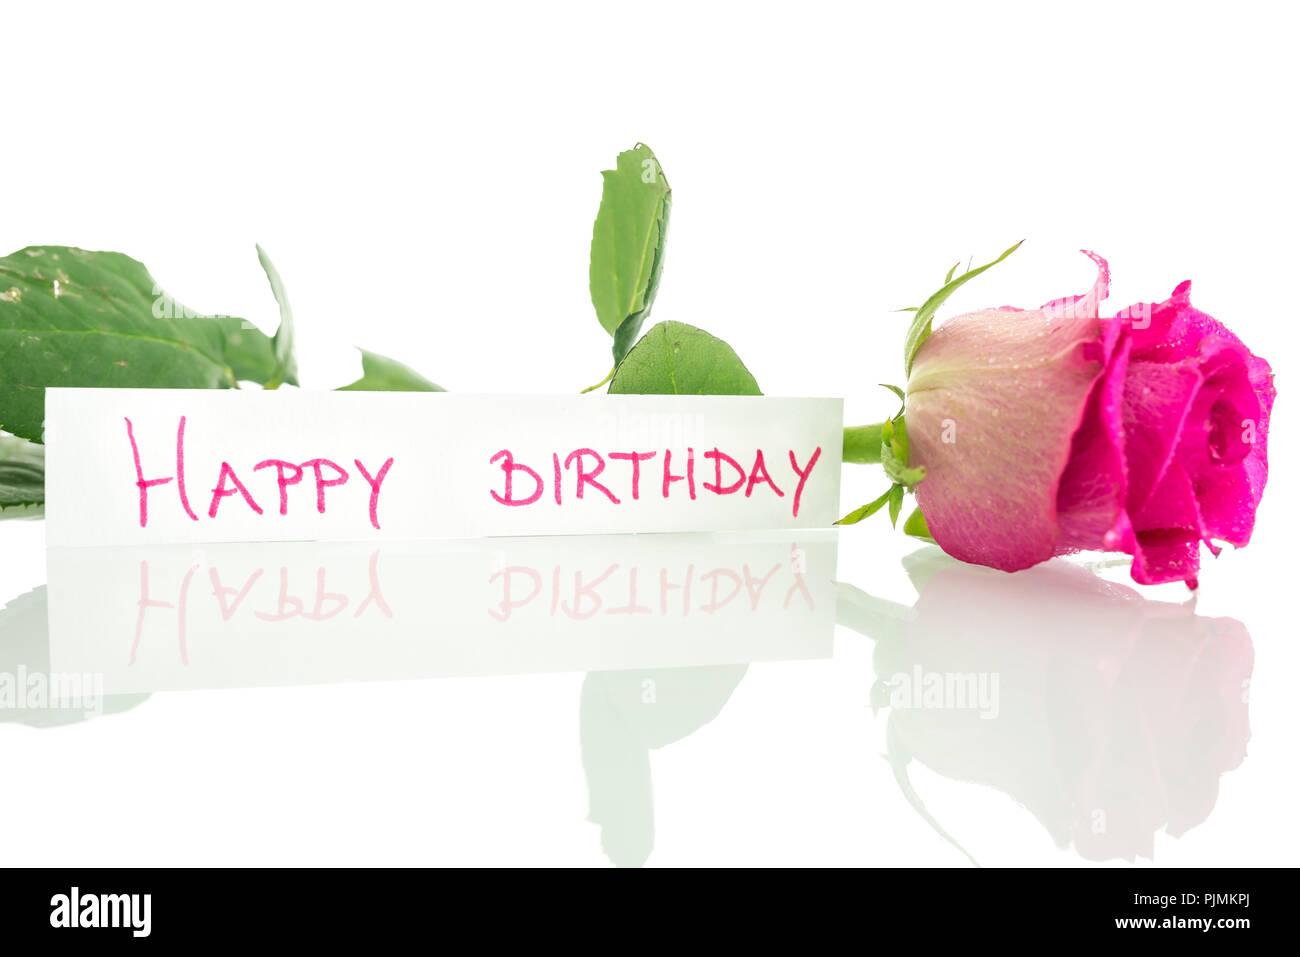 Joyeux Anniversaire Message Leaning On Belle Rose Rose Sur Fond Blanc Photo Stock Alamy